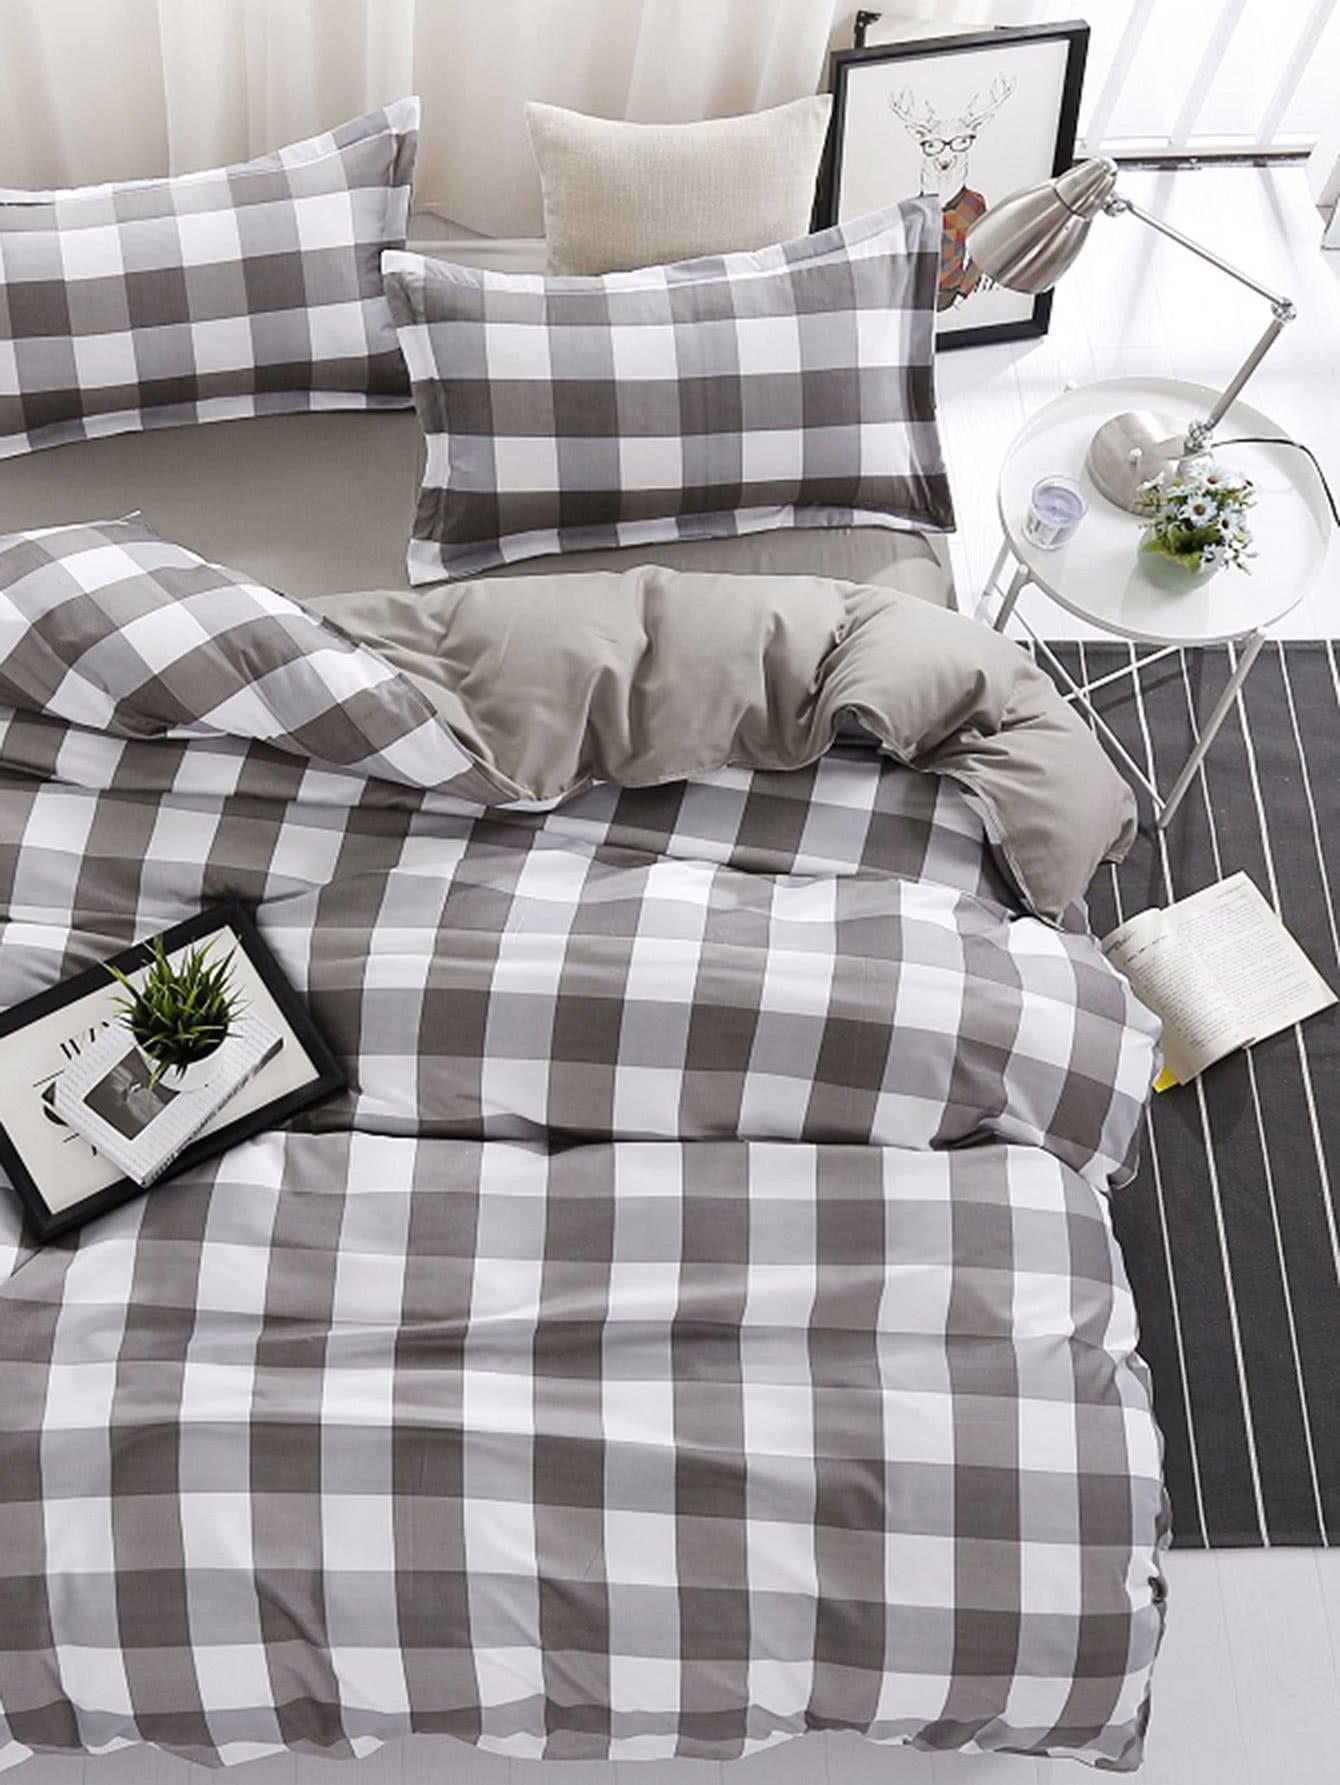 Plaid Bed Sheet Set clara clark premier 1800 series bed sheet collection